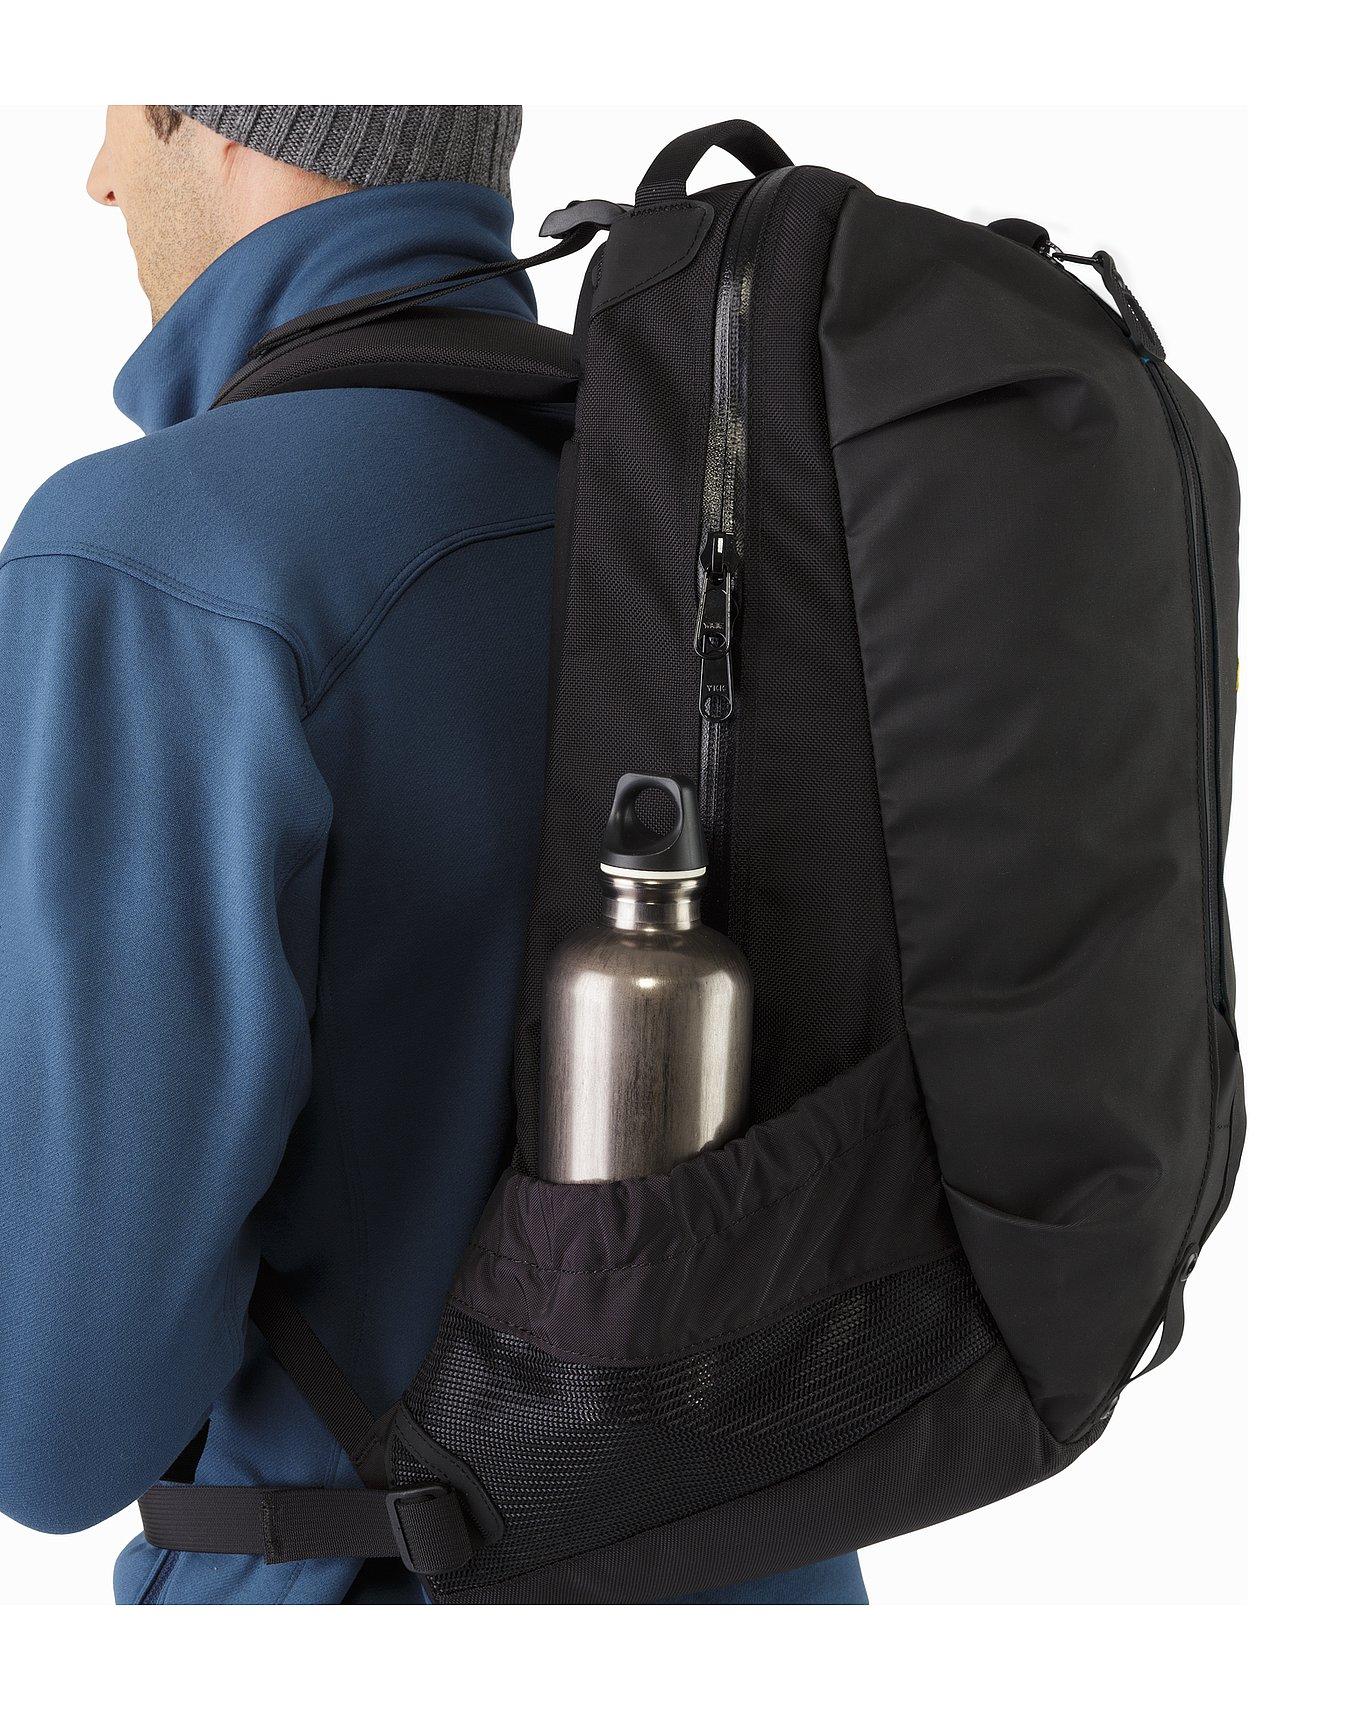 Arro-22-Backpack-Black-Mesh-Stow-Pocket.jpg